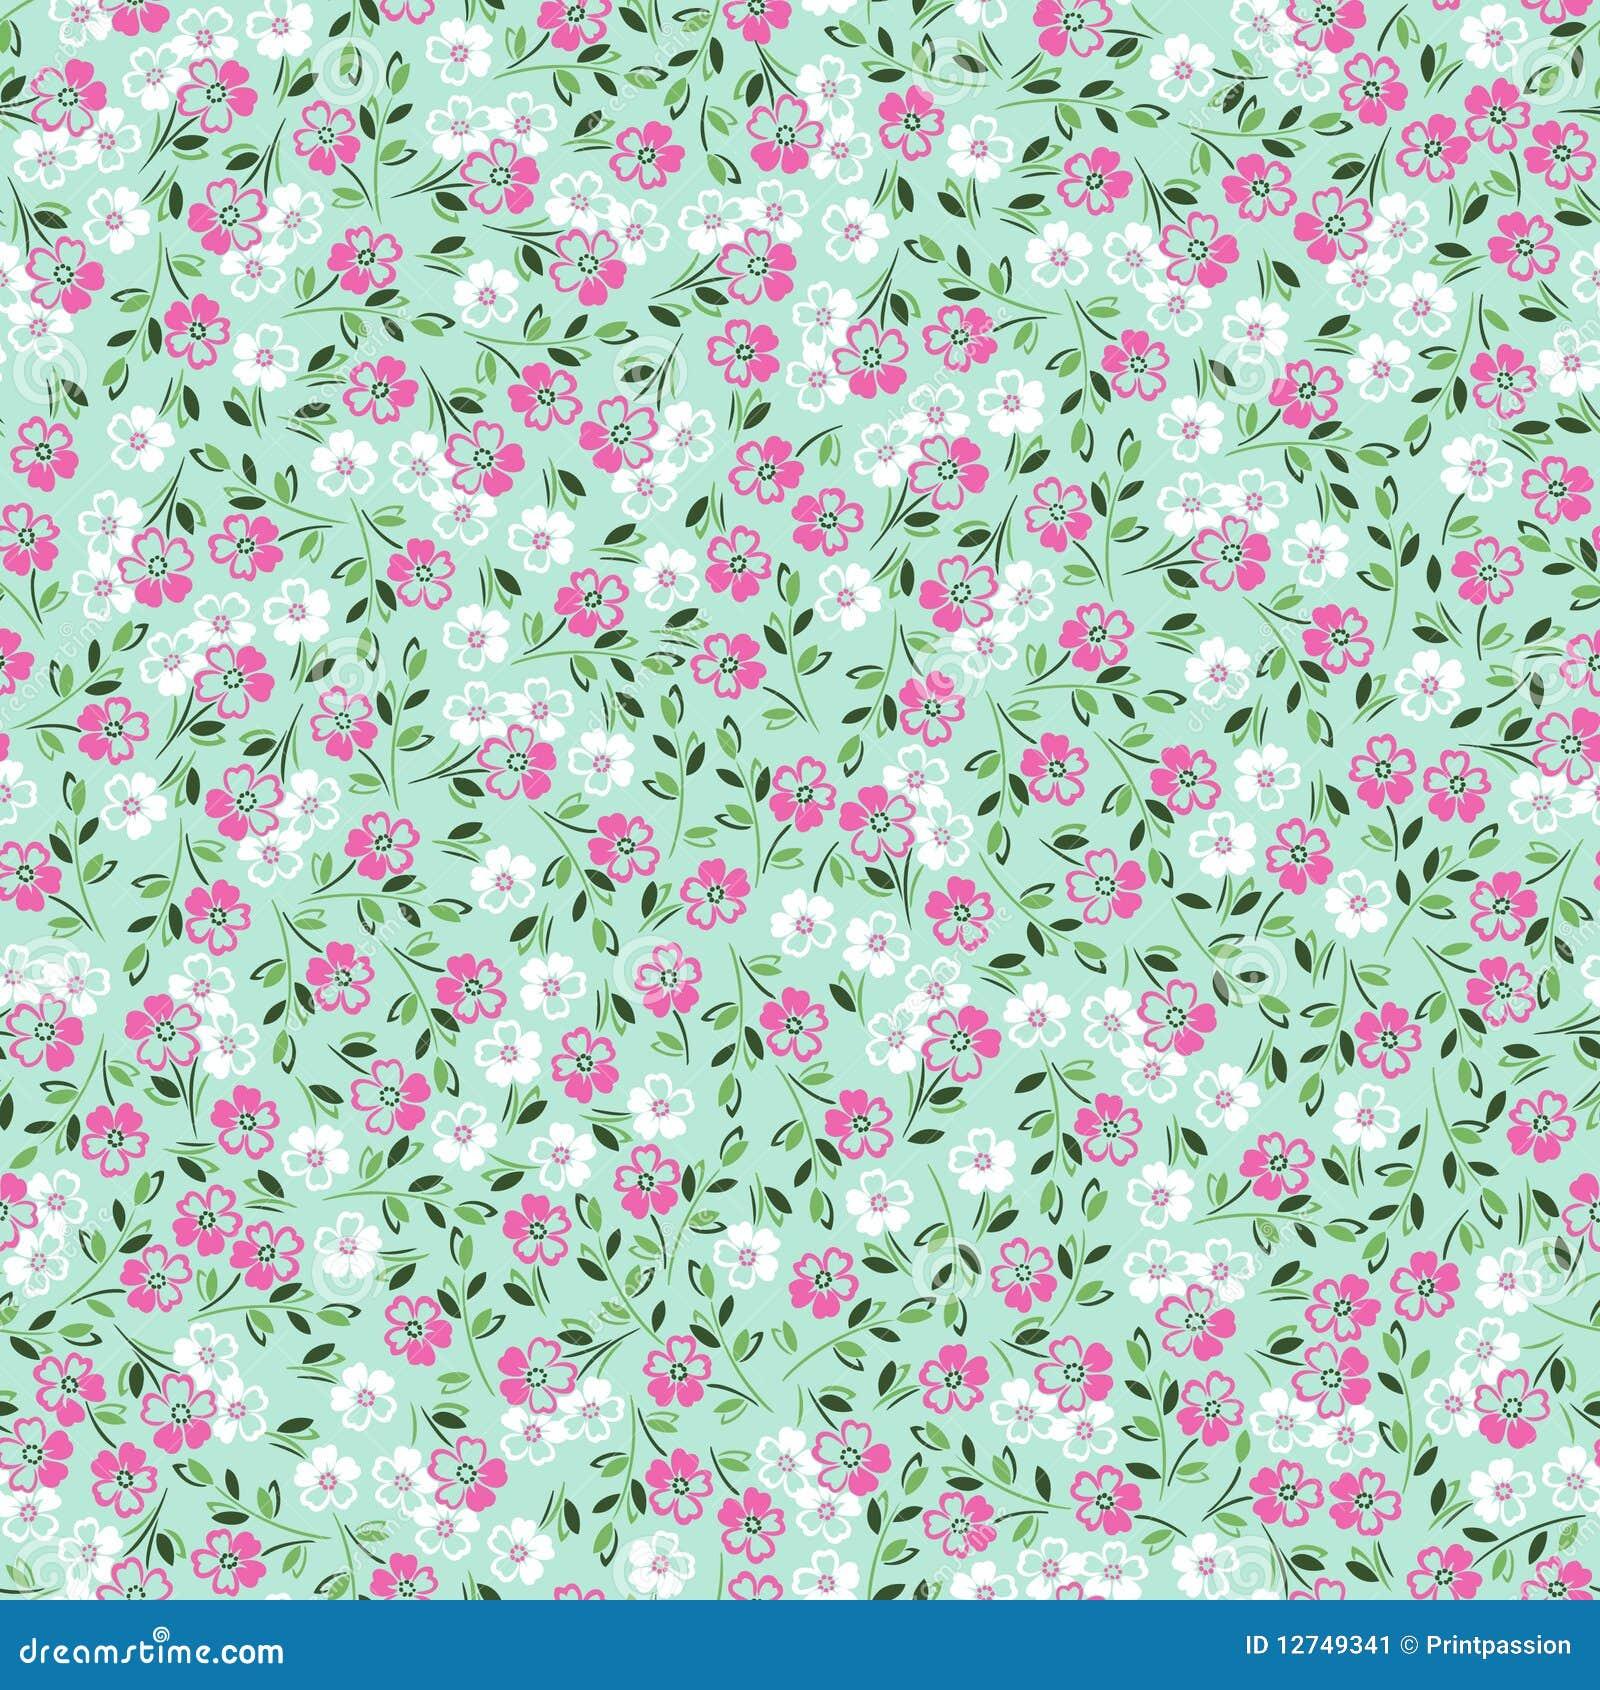 2015 Ditsy Floral Design: Ditsy Floral Stock Vector. Image Of Wallpaper, Design